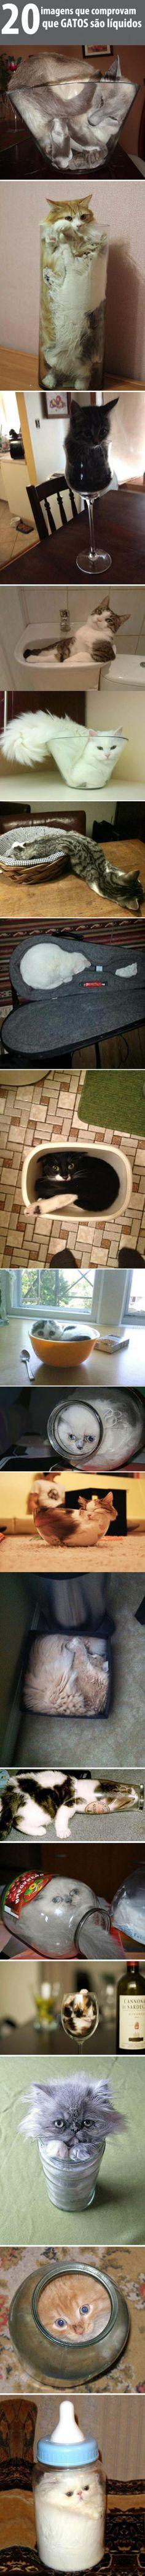 Gatos Líquidos #cats